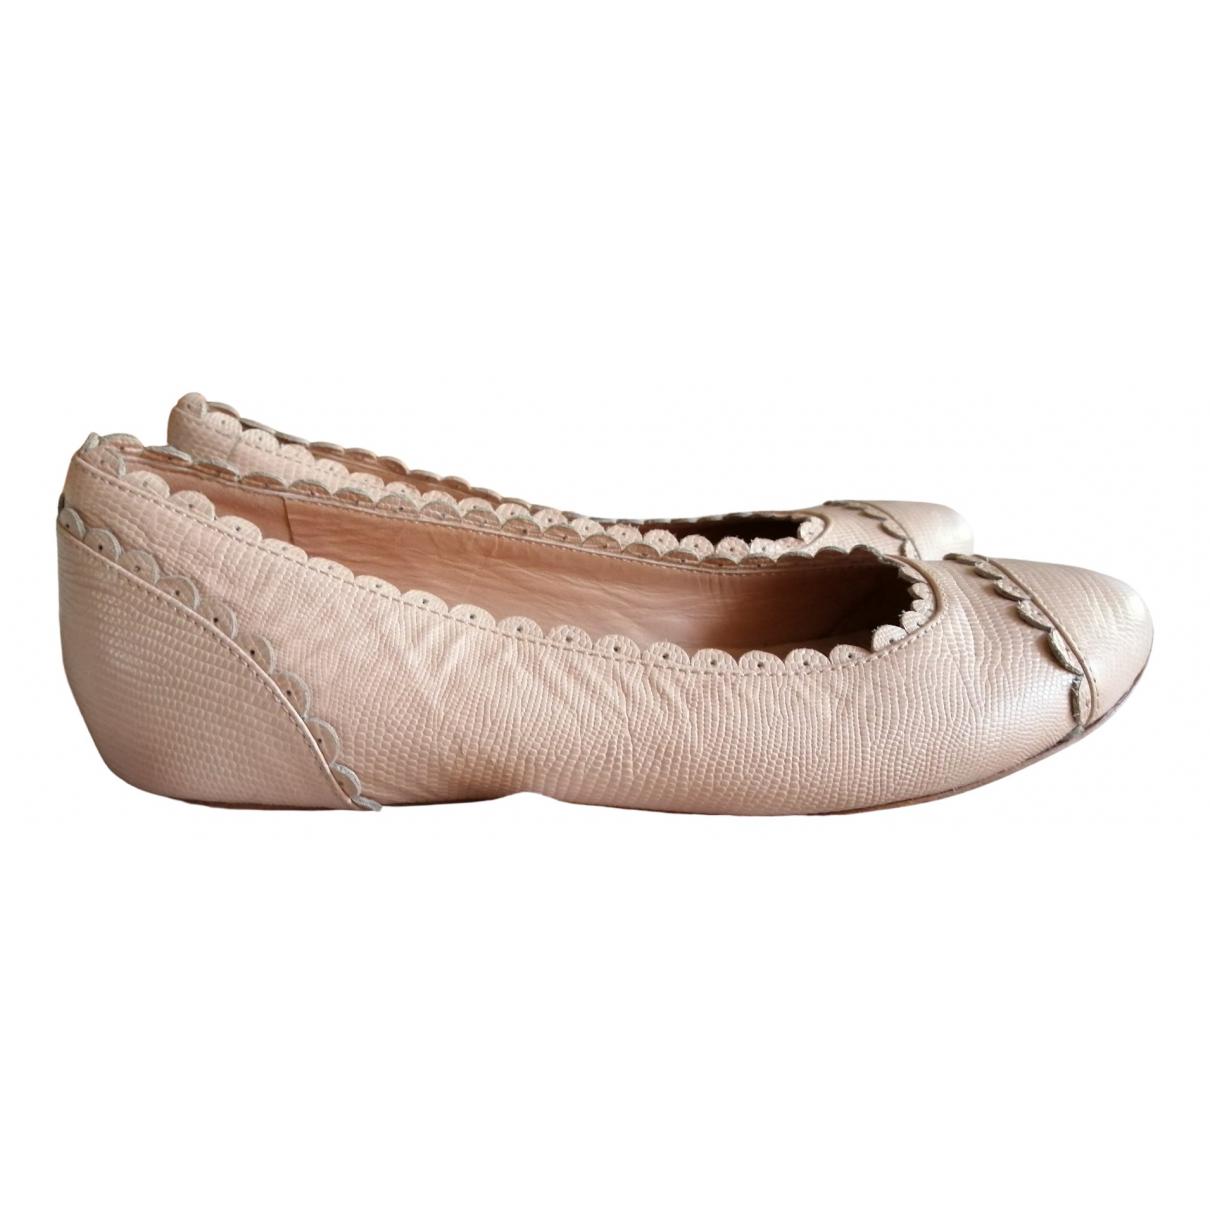 Chloé \N Pink Leather Ballet flats for Women 37.5 EU